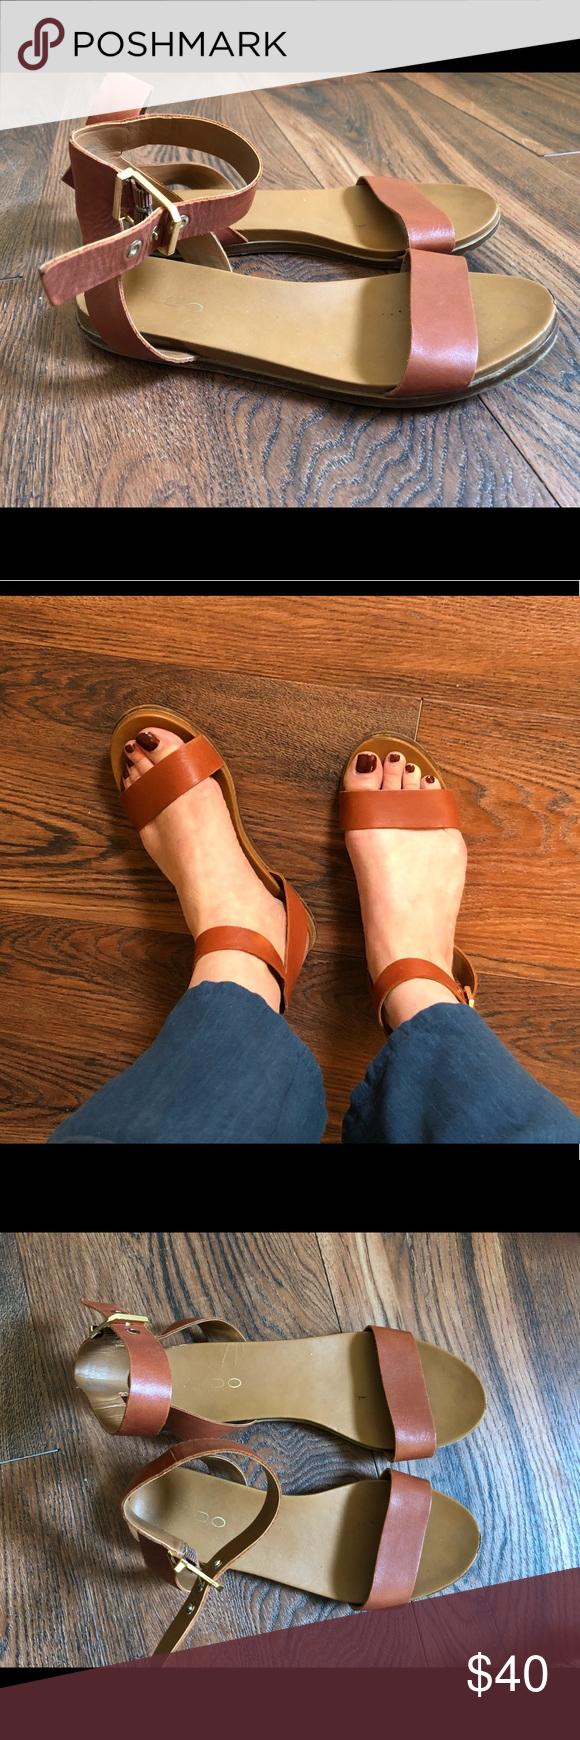 2552bc86435 ALDO Campodoro Sandal in Cognac Classic. Modern. Forever versatile. This  flat ankle-